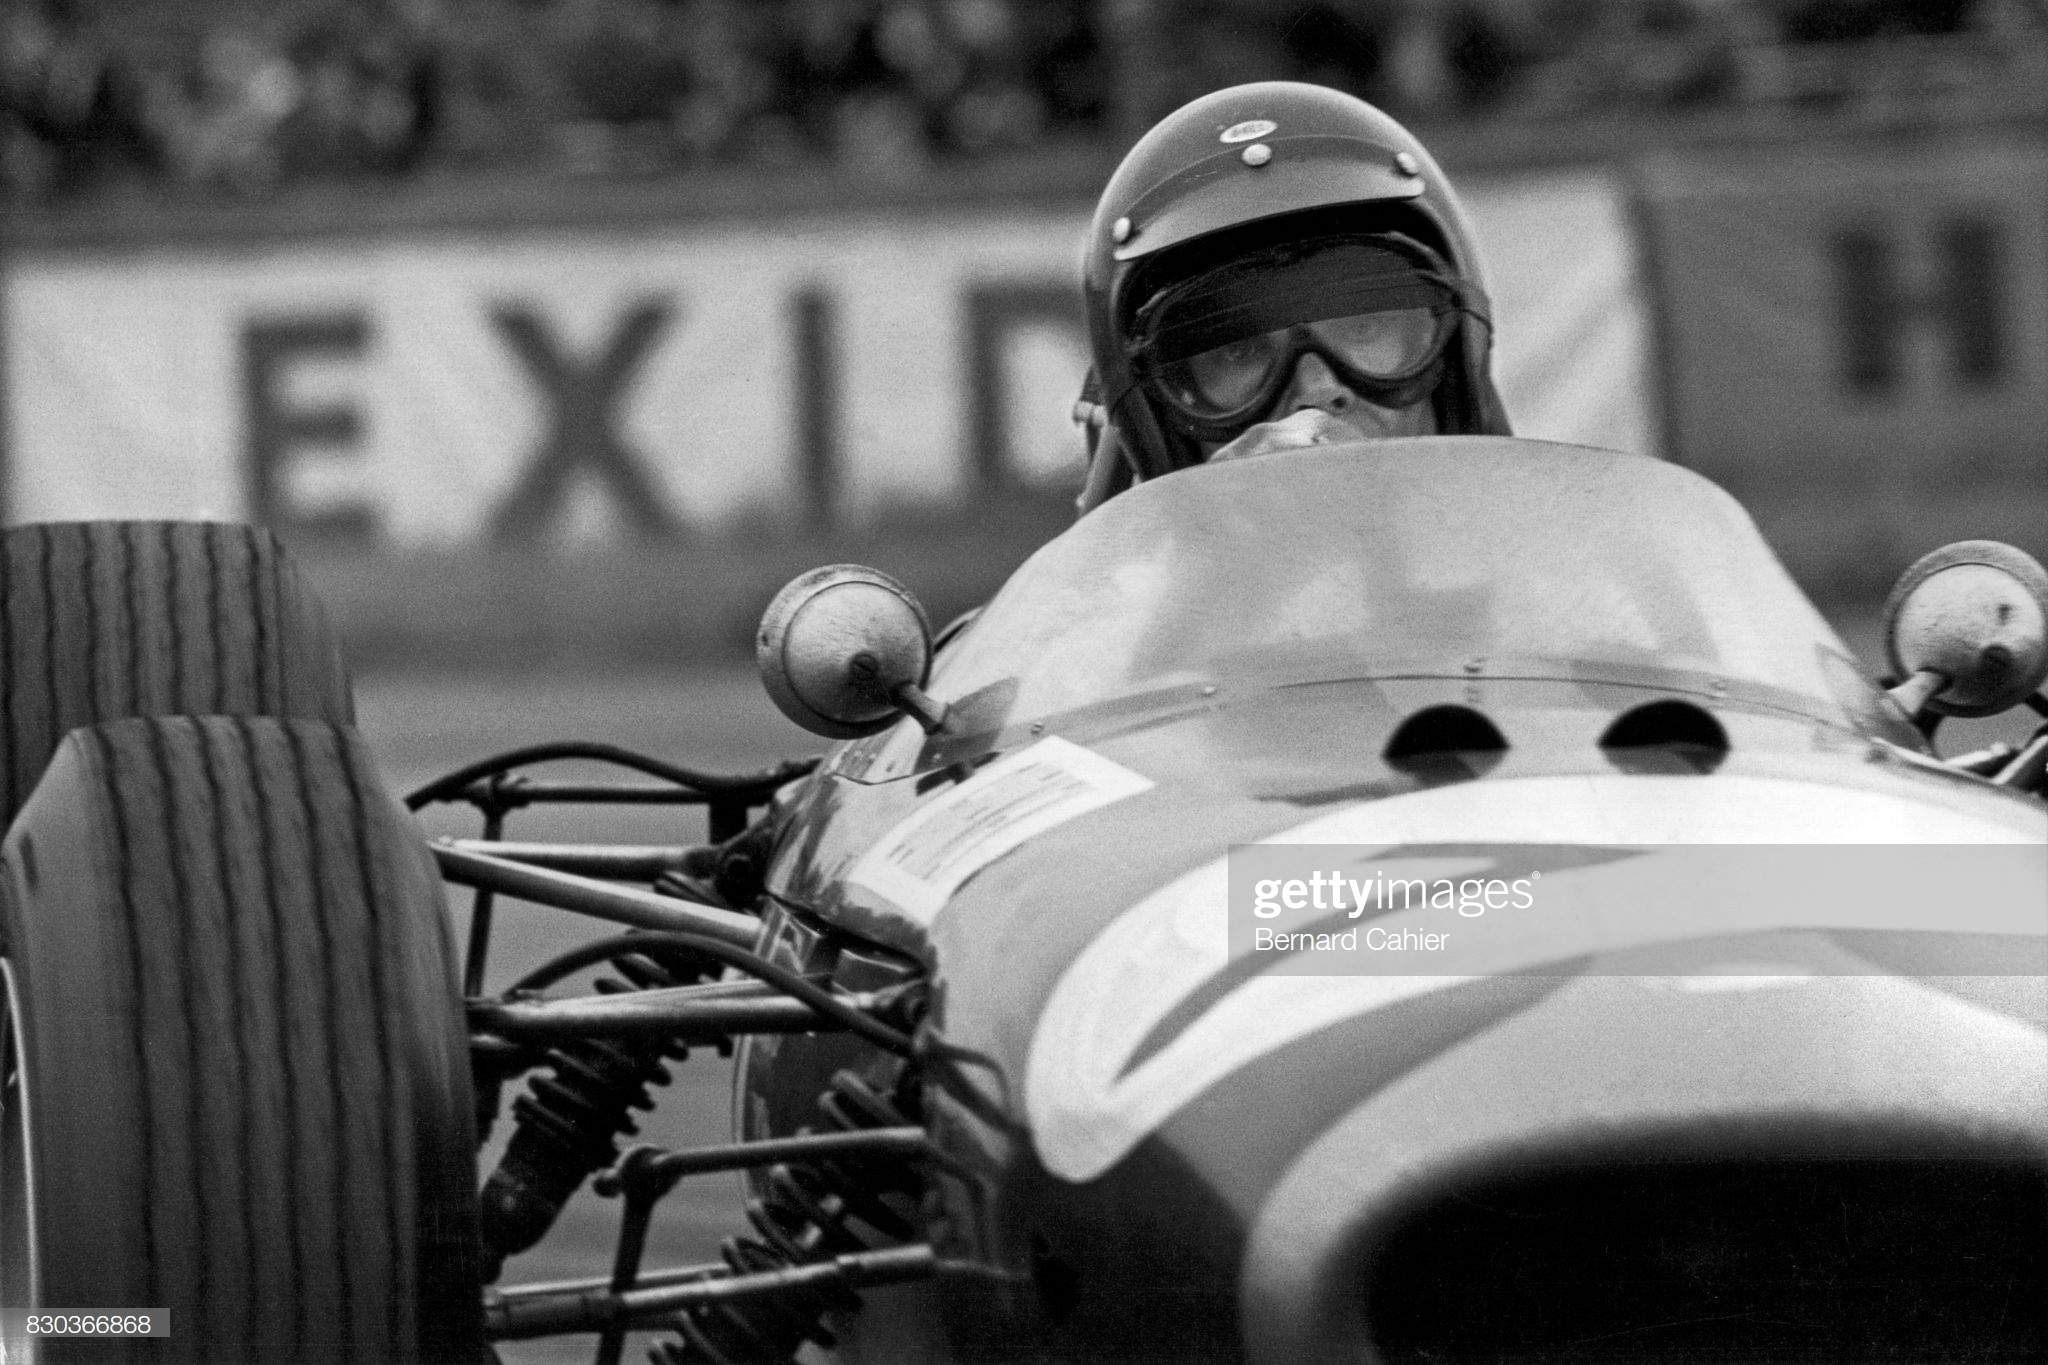 Dan Gurney, Silverstone, 10 July 1965 - Photo by Bernard Cahier/Getty Images